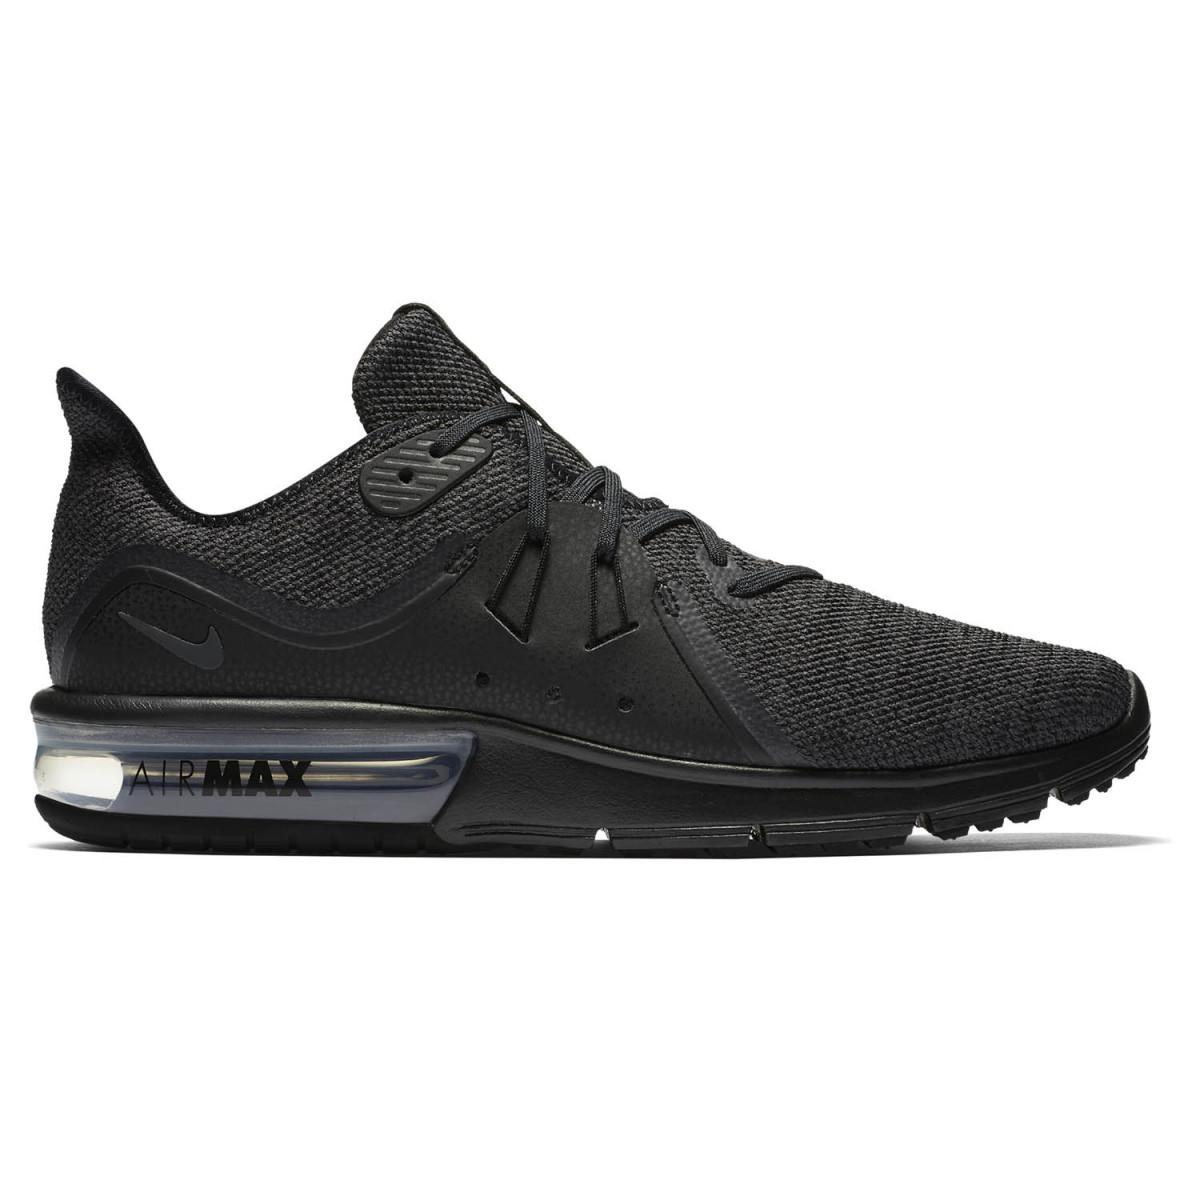 cheap for discount 8ef0d 72e8c Zapatillas Nike Air Max Sequent 3 - Oferta